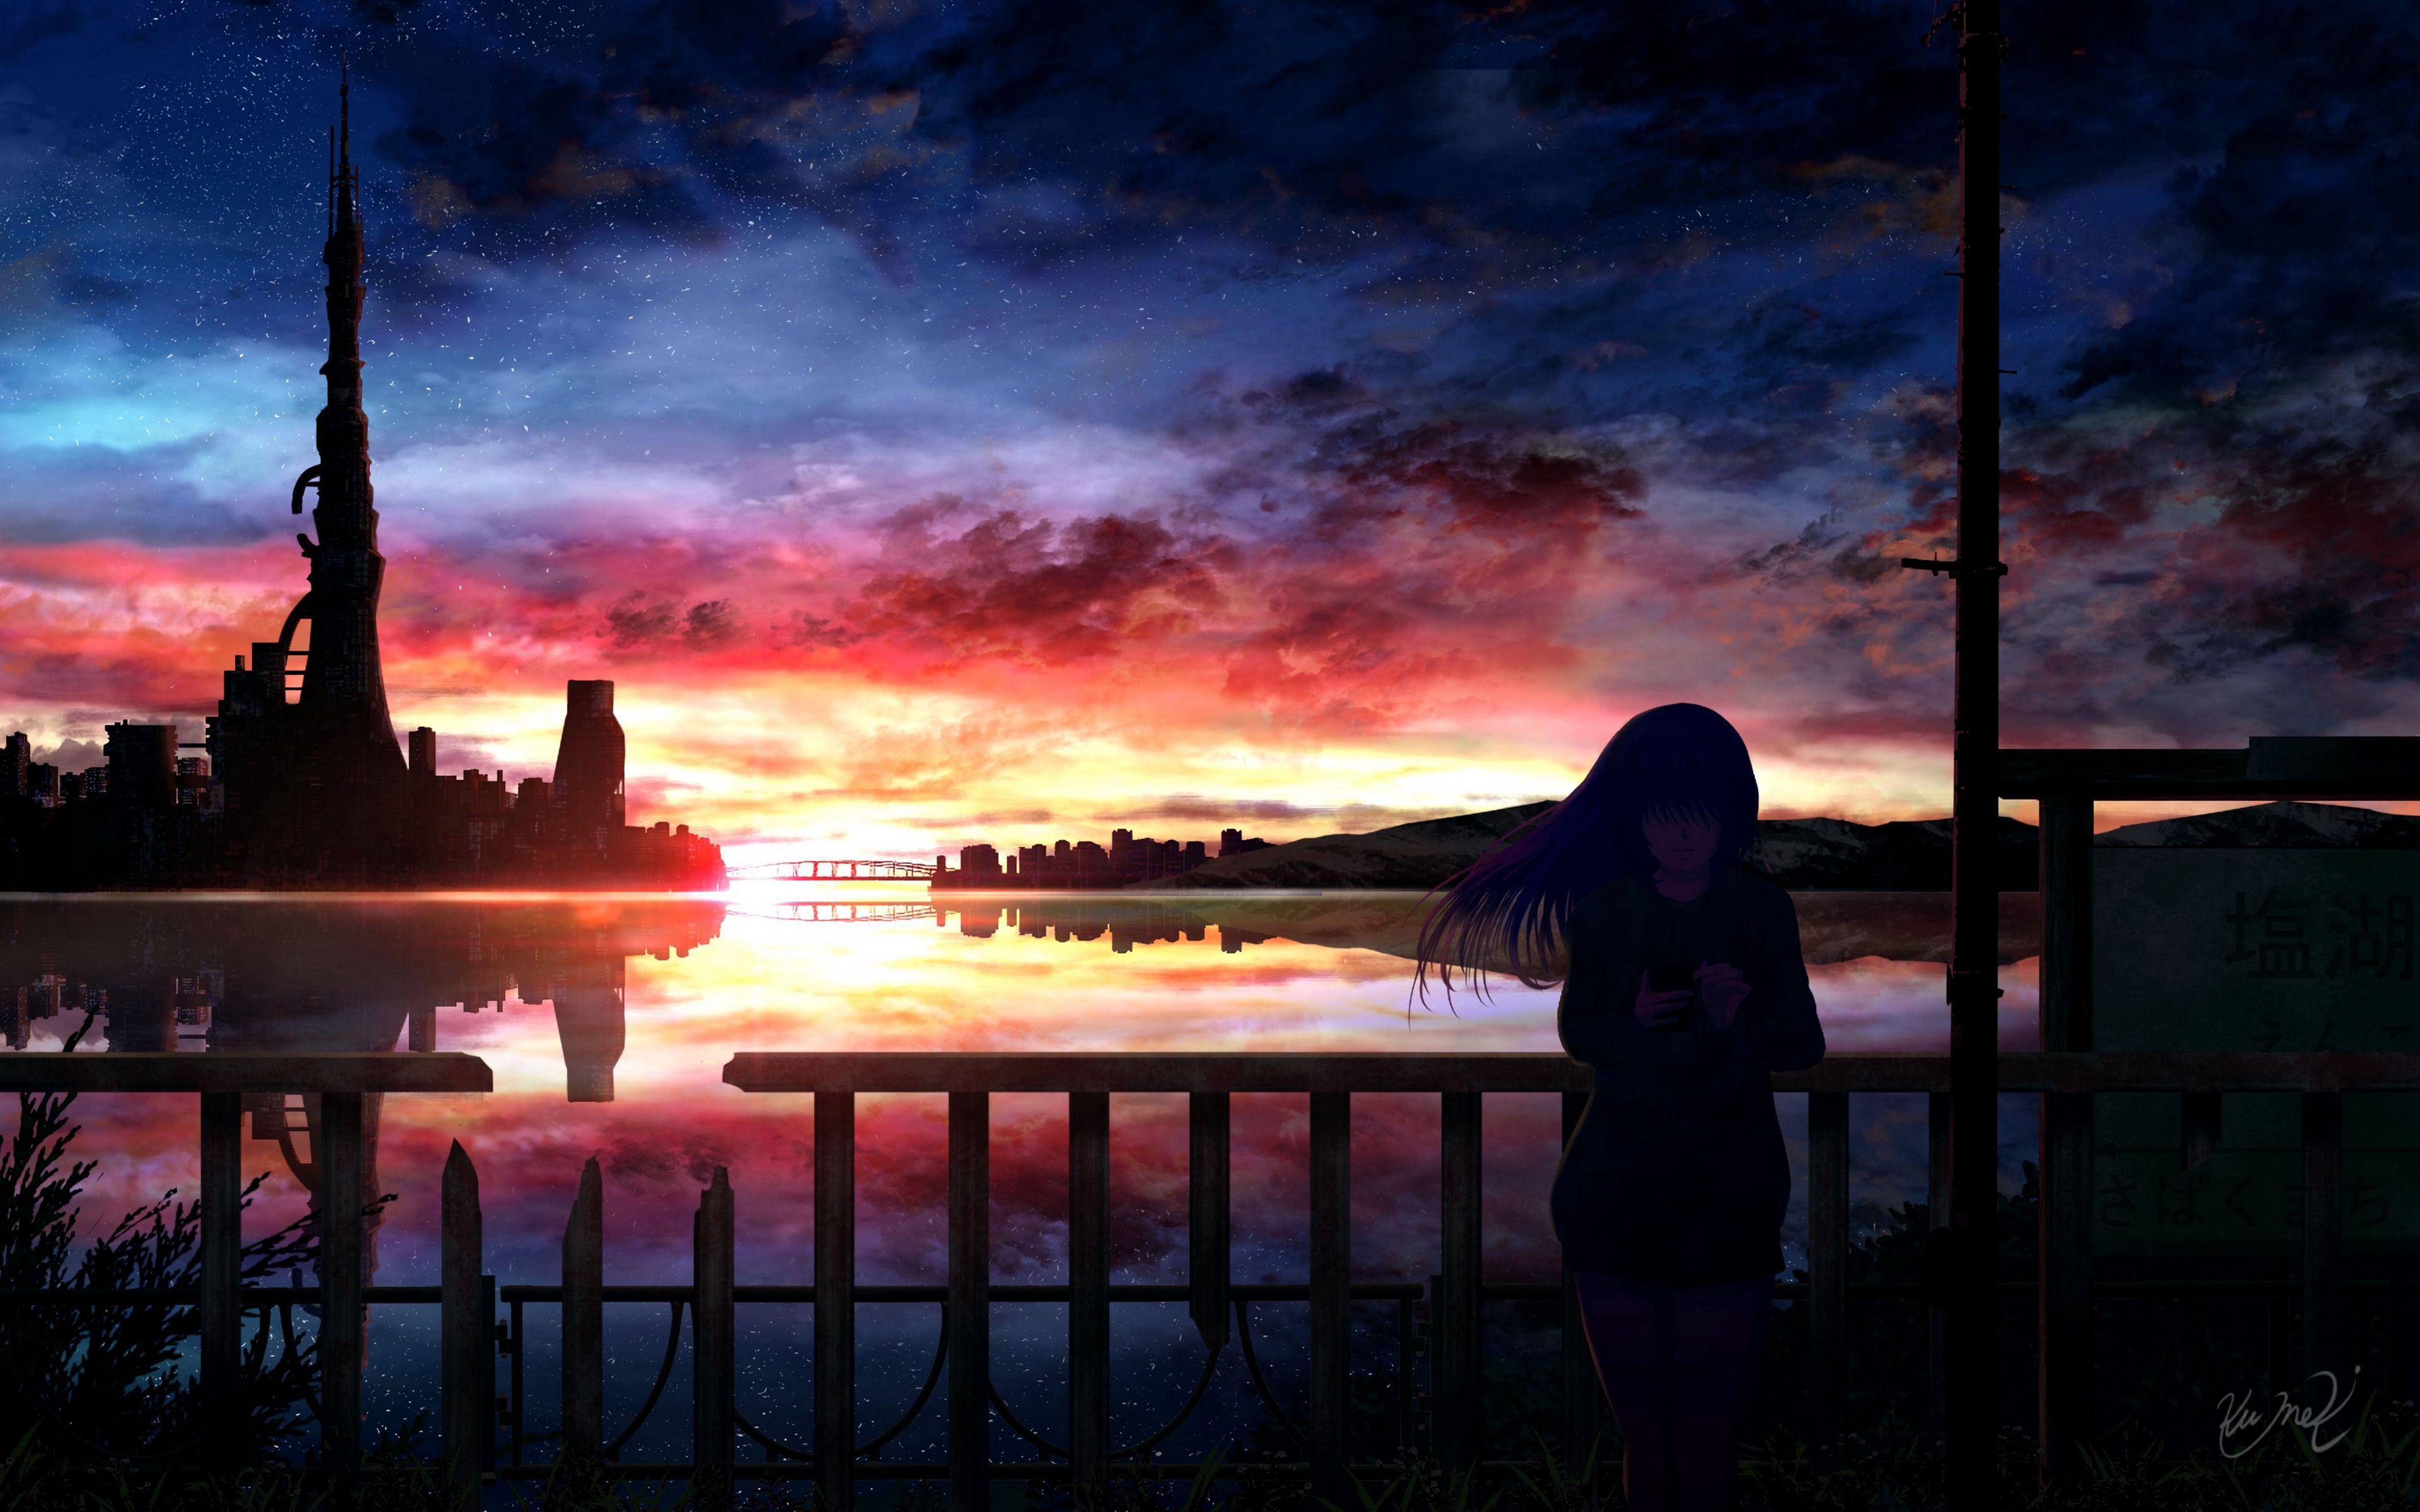 Download wallpaper 3840x2400 silhouette, night, starry sky ...